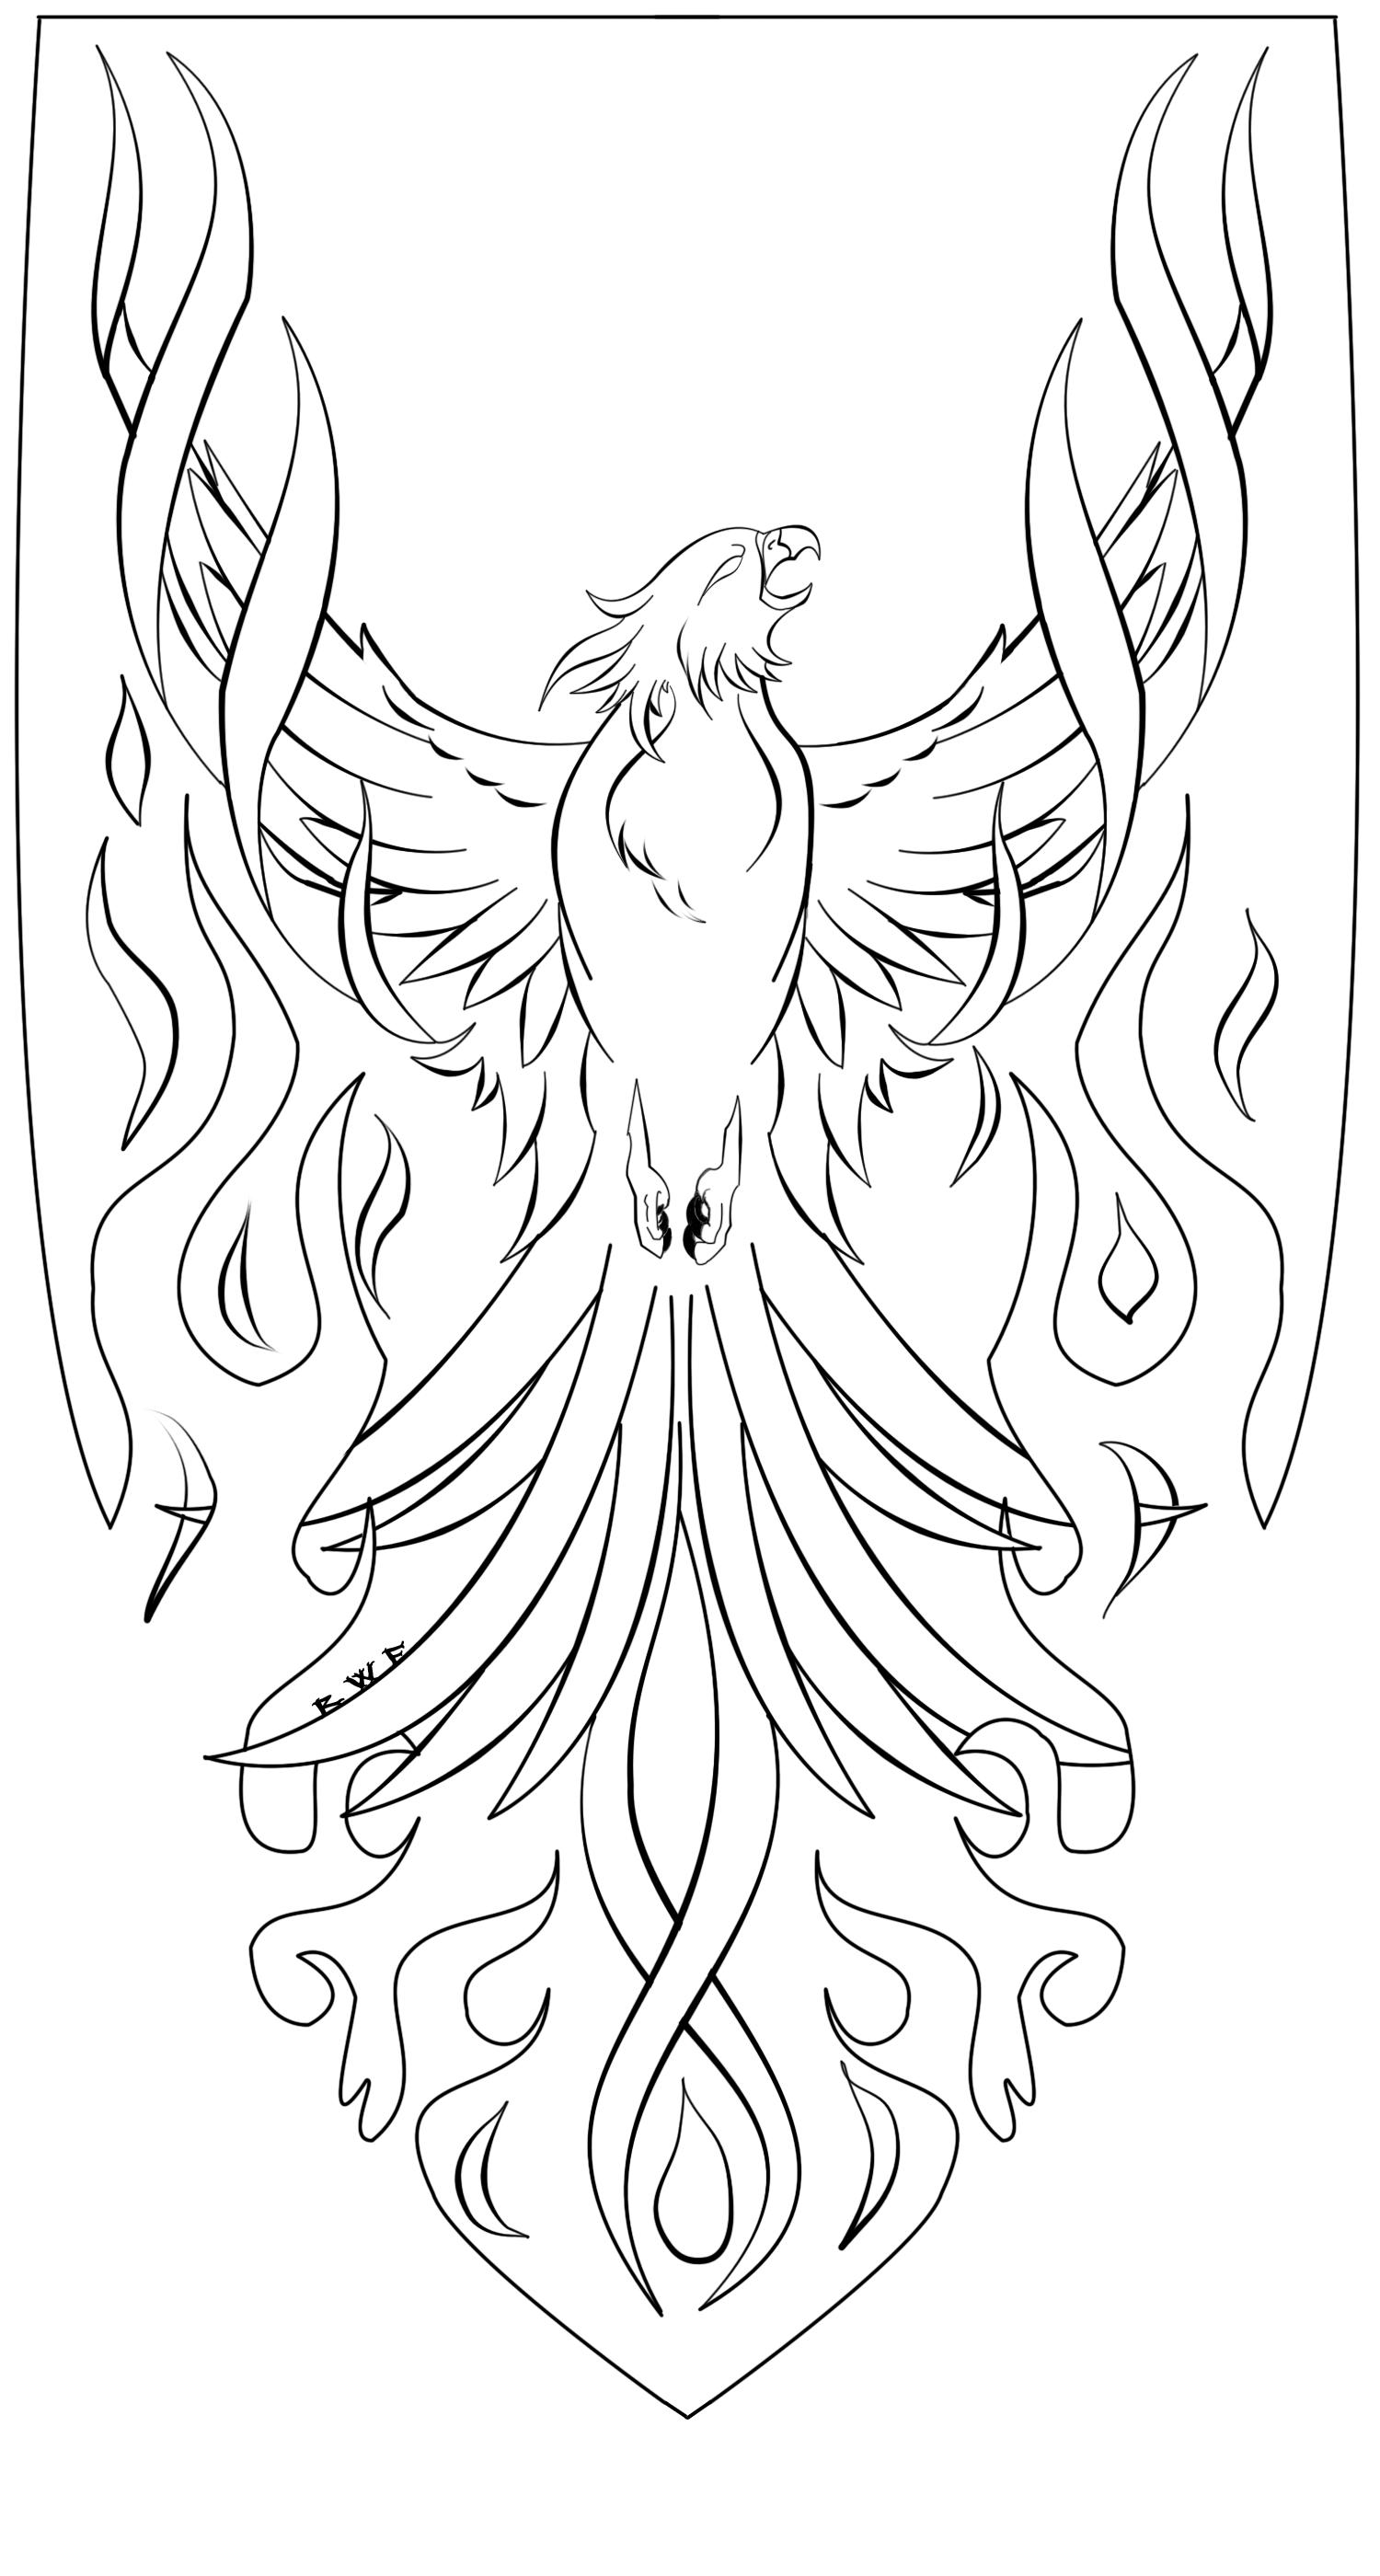 phoenix_lineart_by_ravenwhitefang-d4vfhrm.png (1500×2800)   Coloring ...